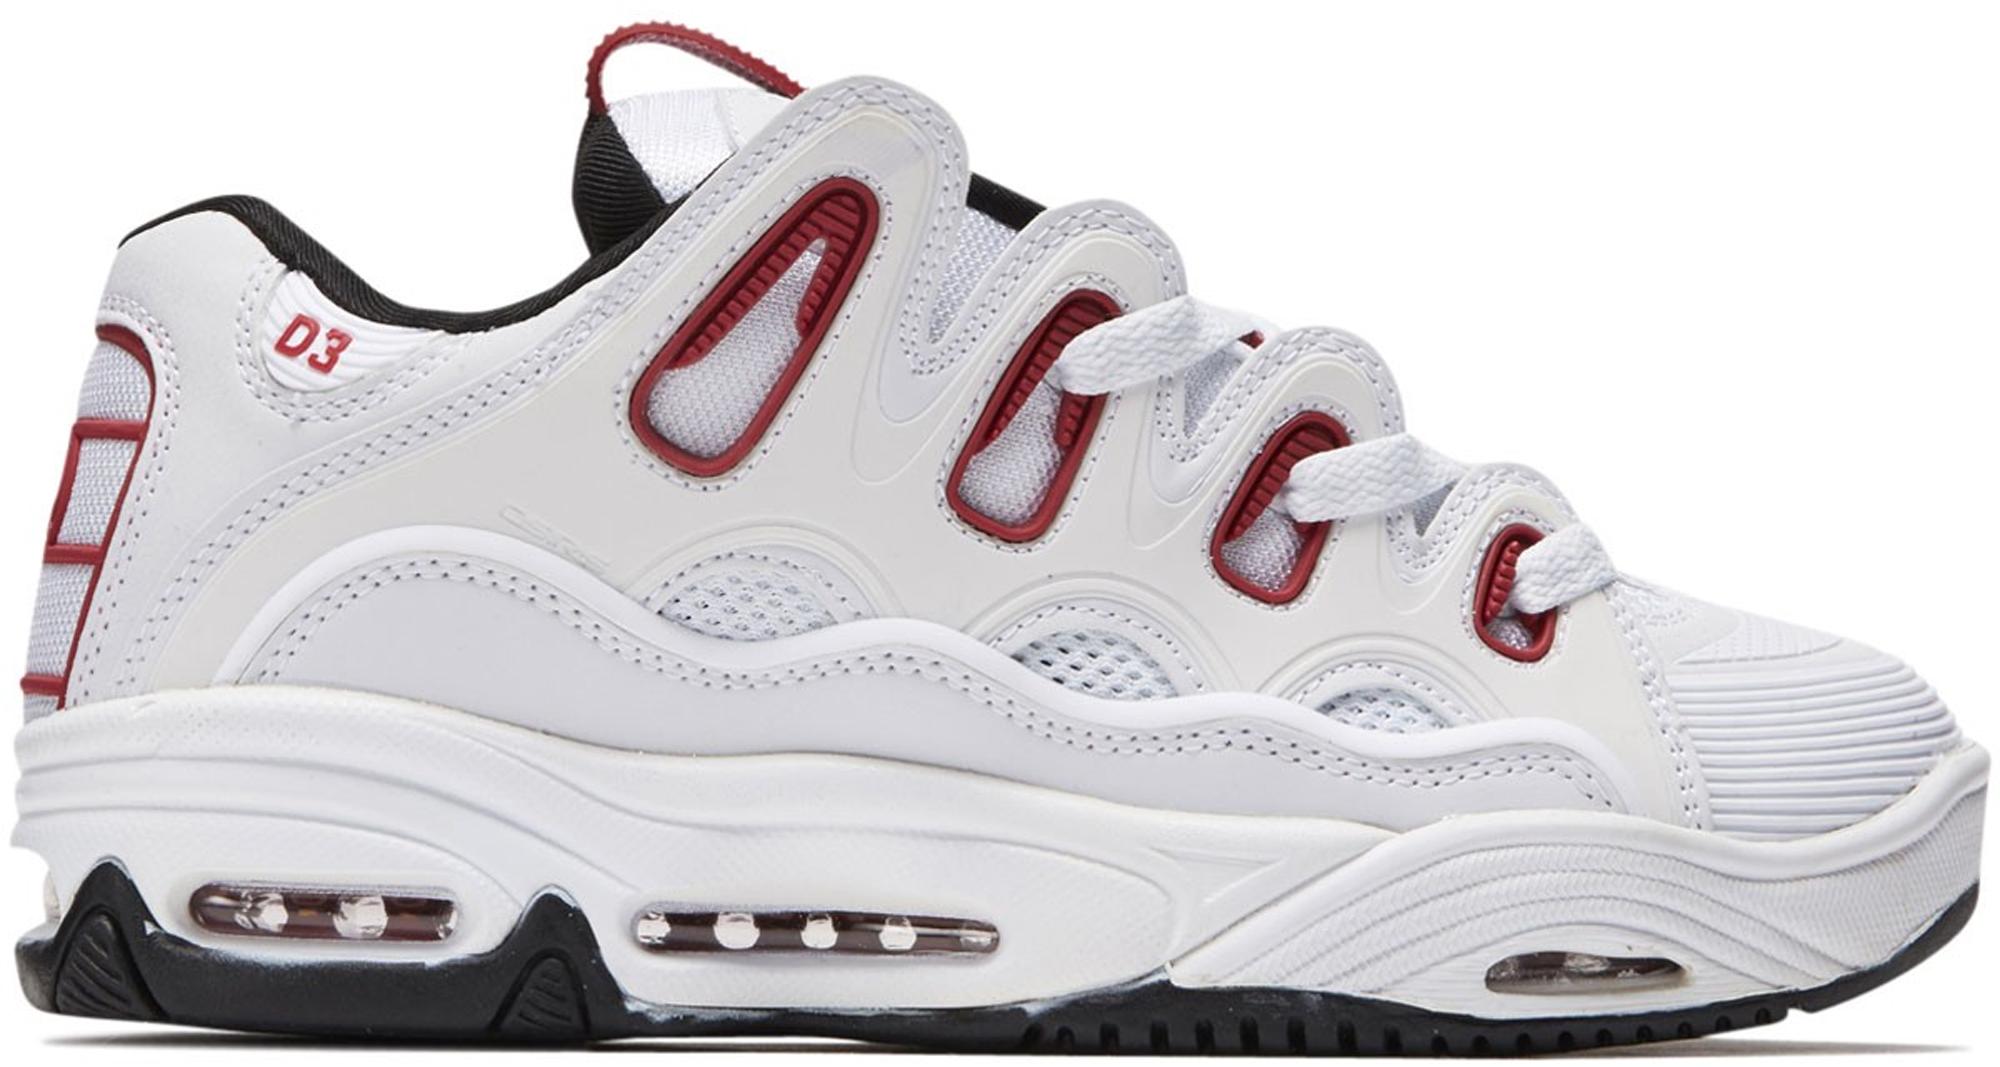 Osiris D3 2001 White Red - Sneakers